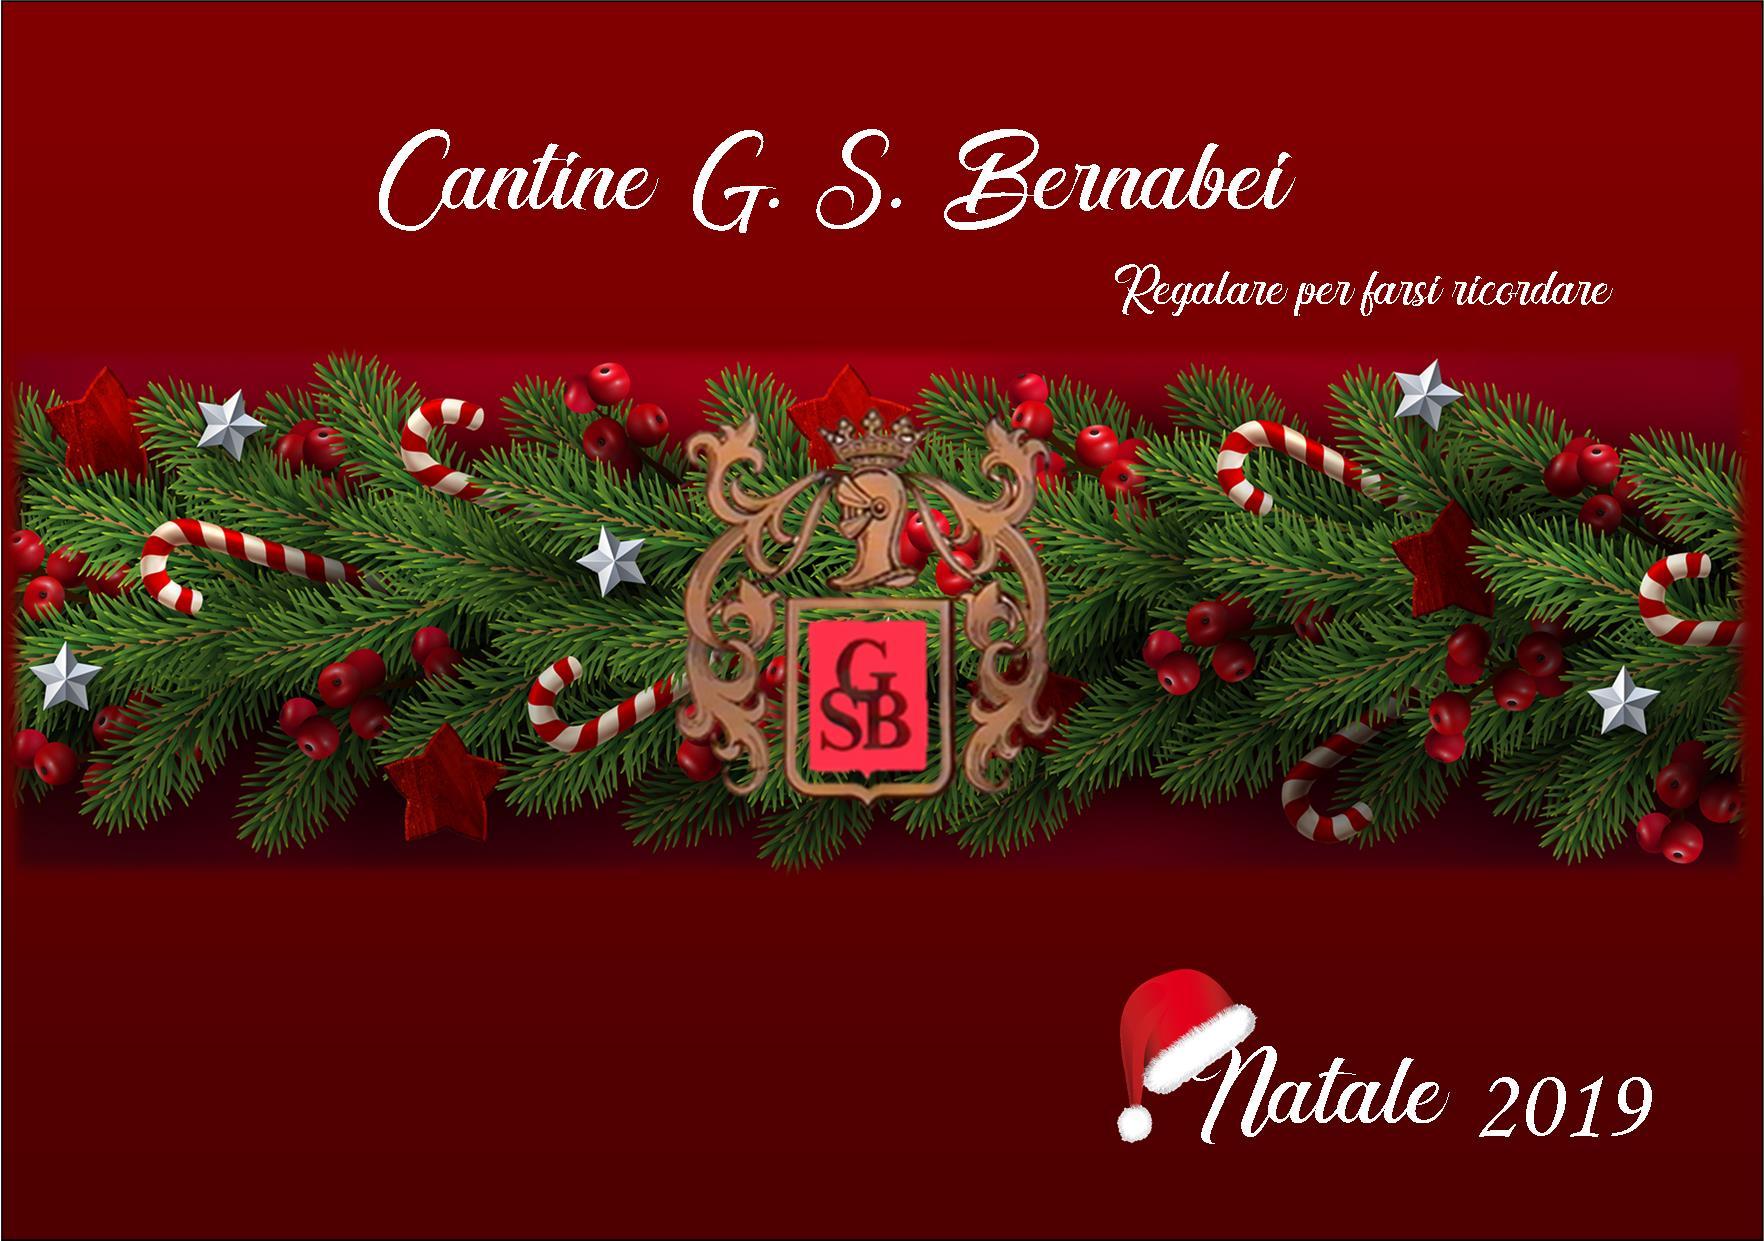 Ceste natalizie vendita online